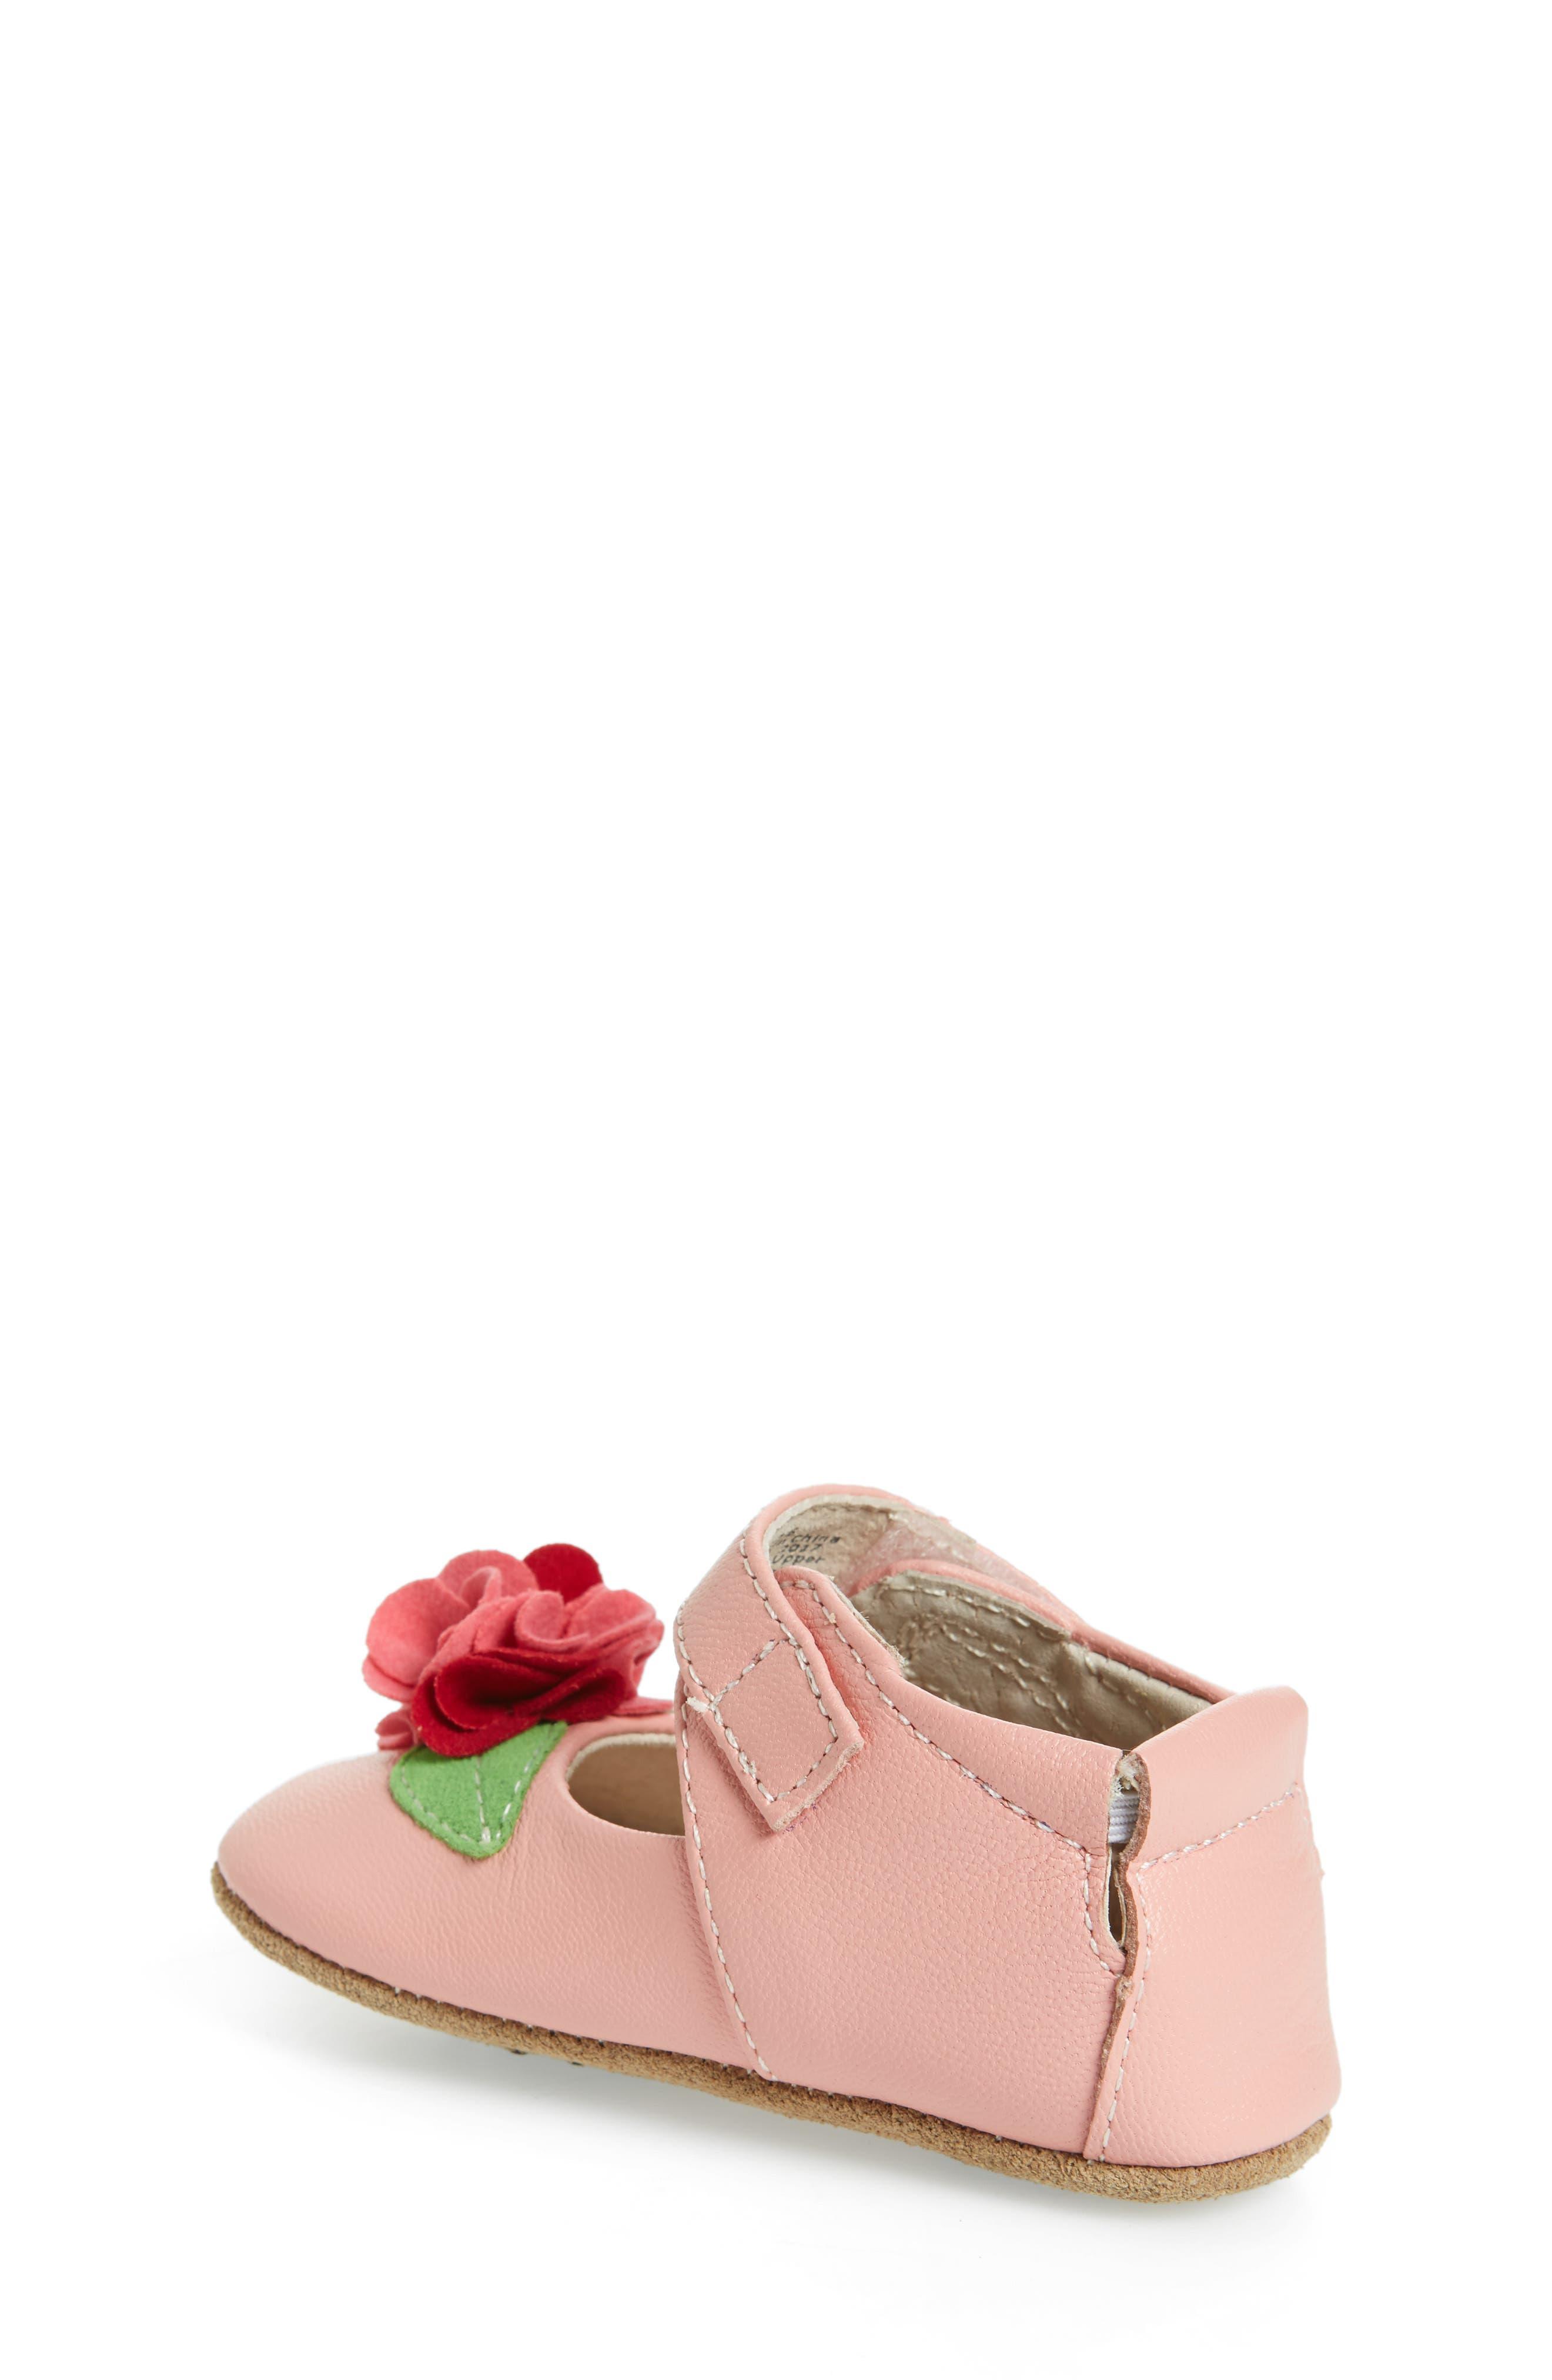 Rosa Mary Jane Crib Shoe,                             Alternate thumbnail 2, color,                             Light Pink